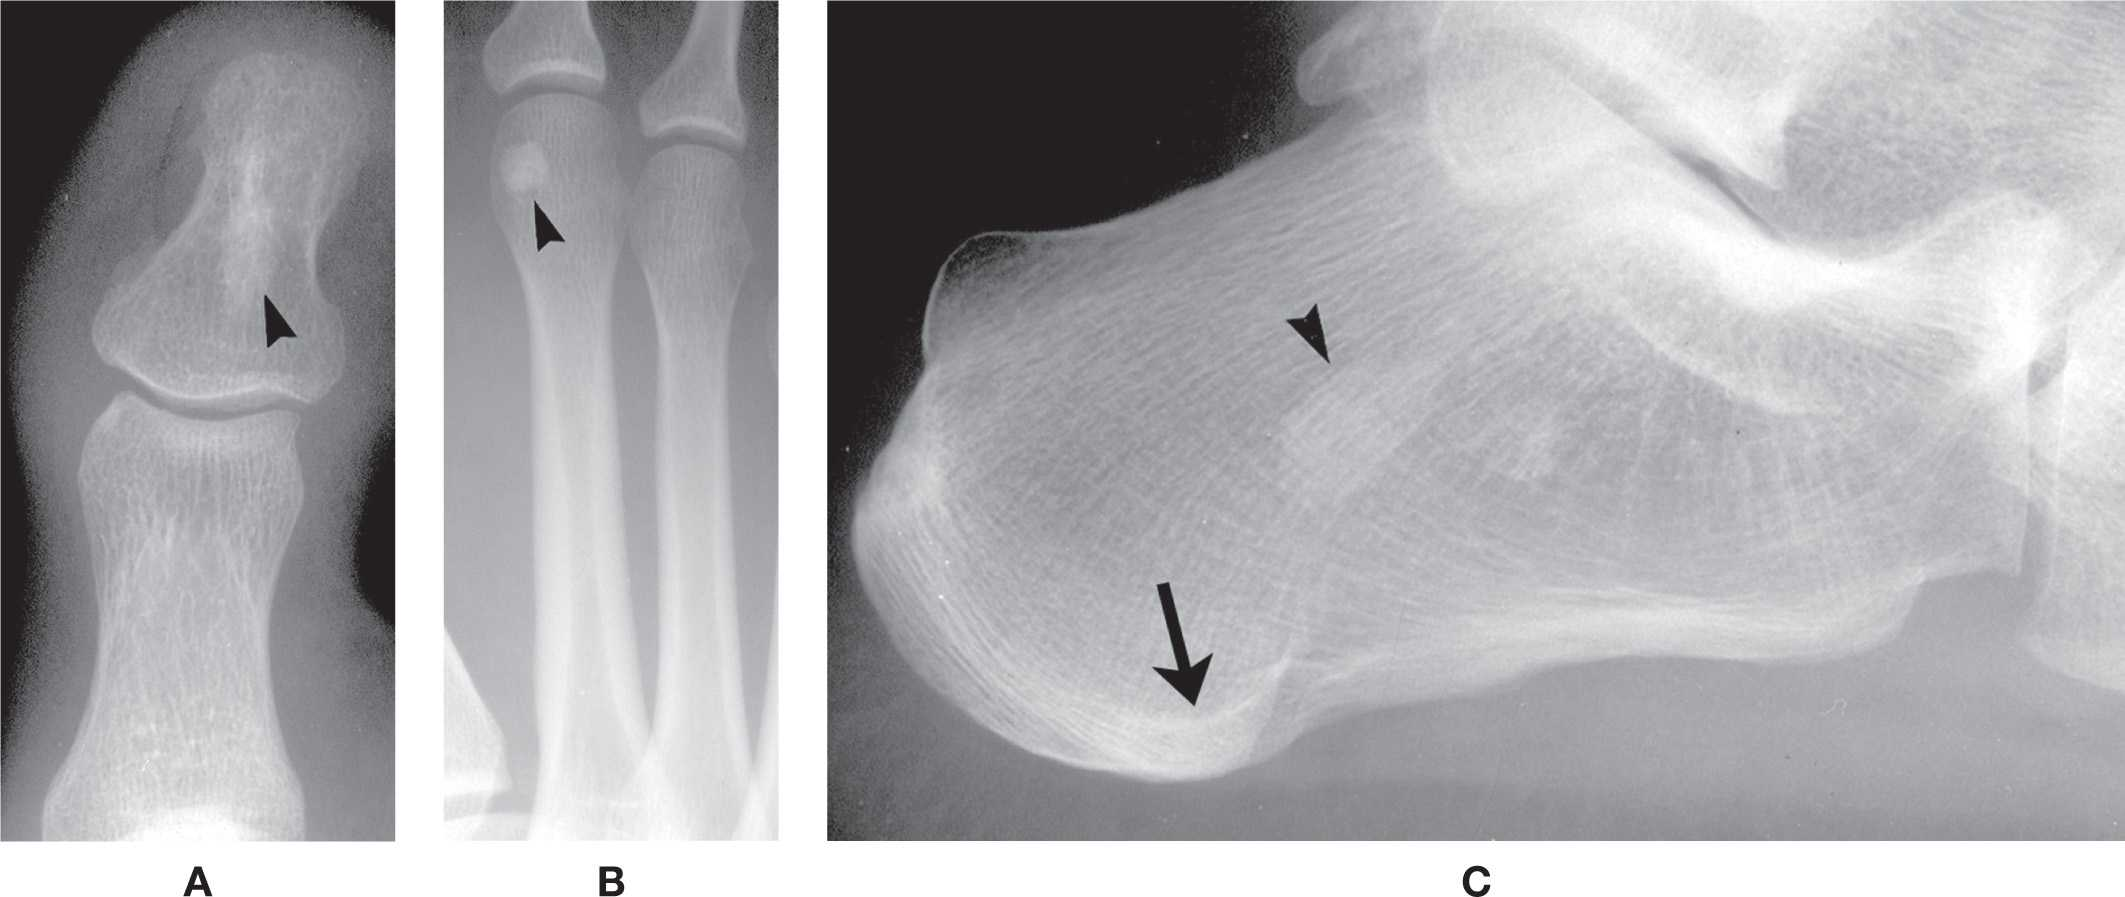 Ankylosing Spondylitis and Rheumatoid Arthritis